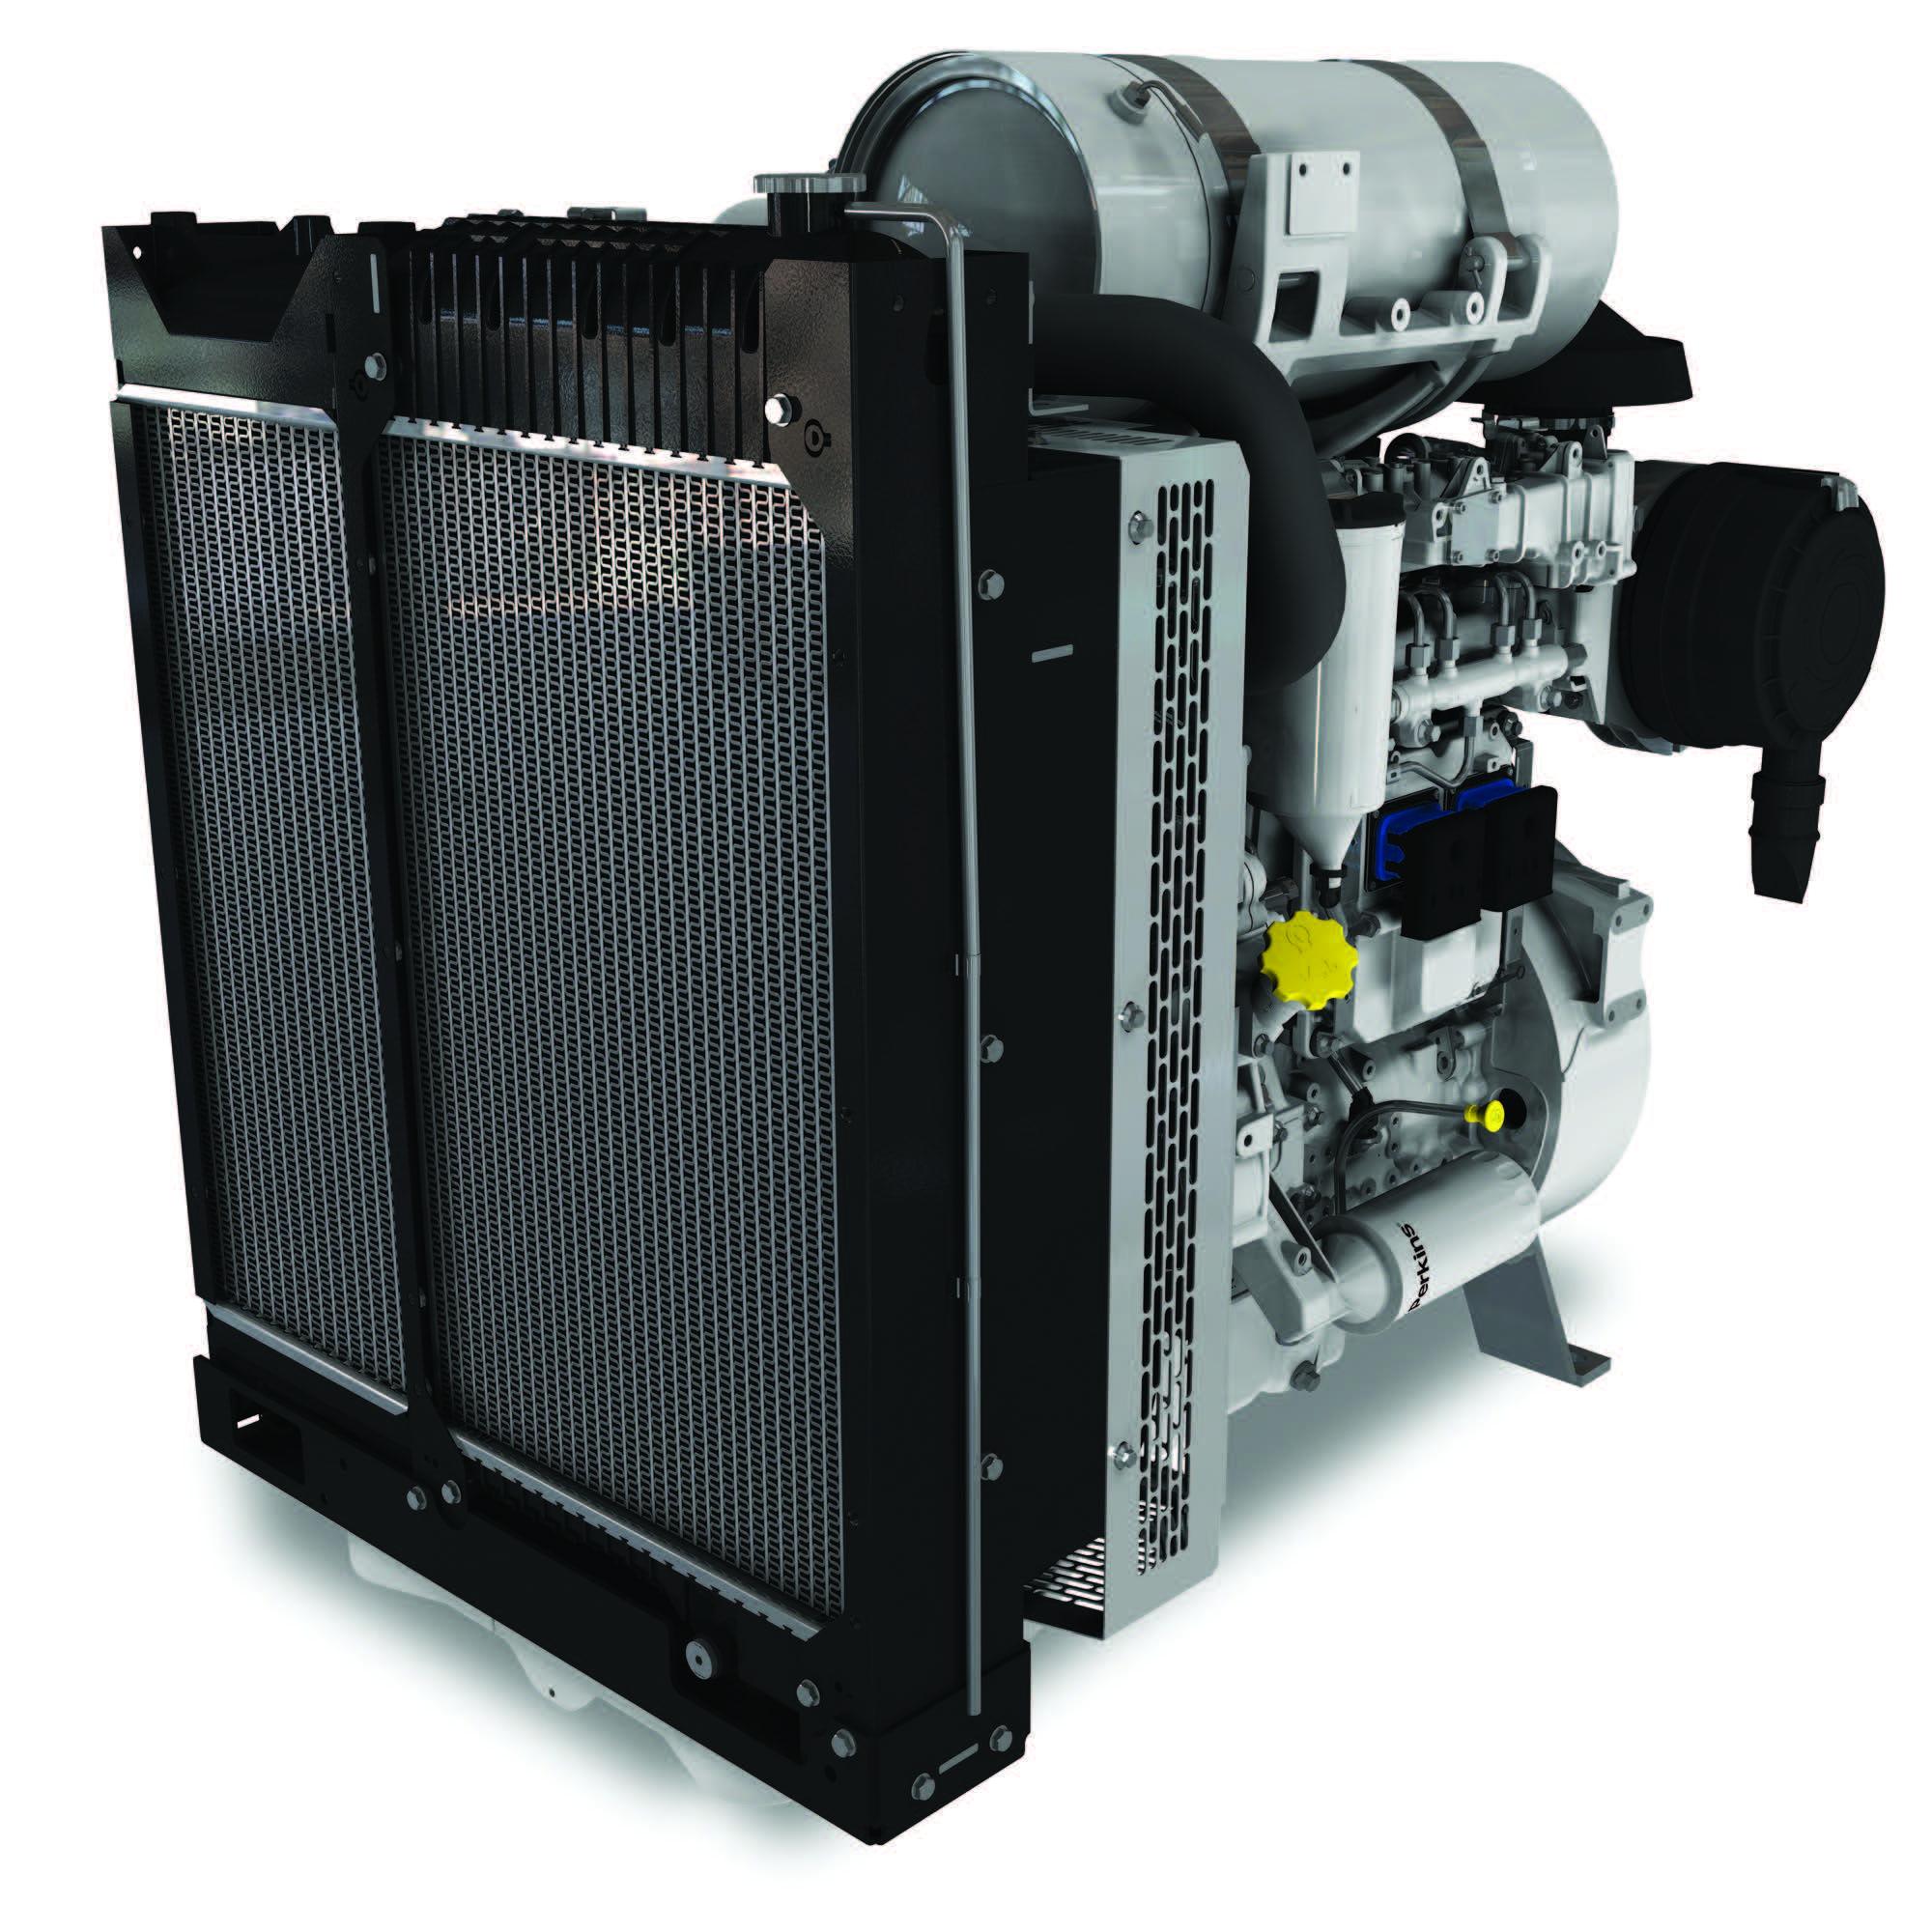 1204E-E44TAG1 Diesel Engine – ElectropaK